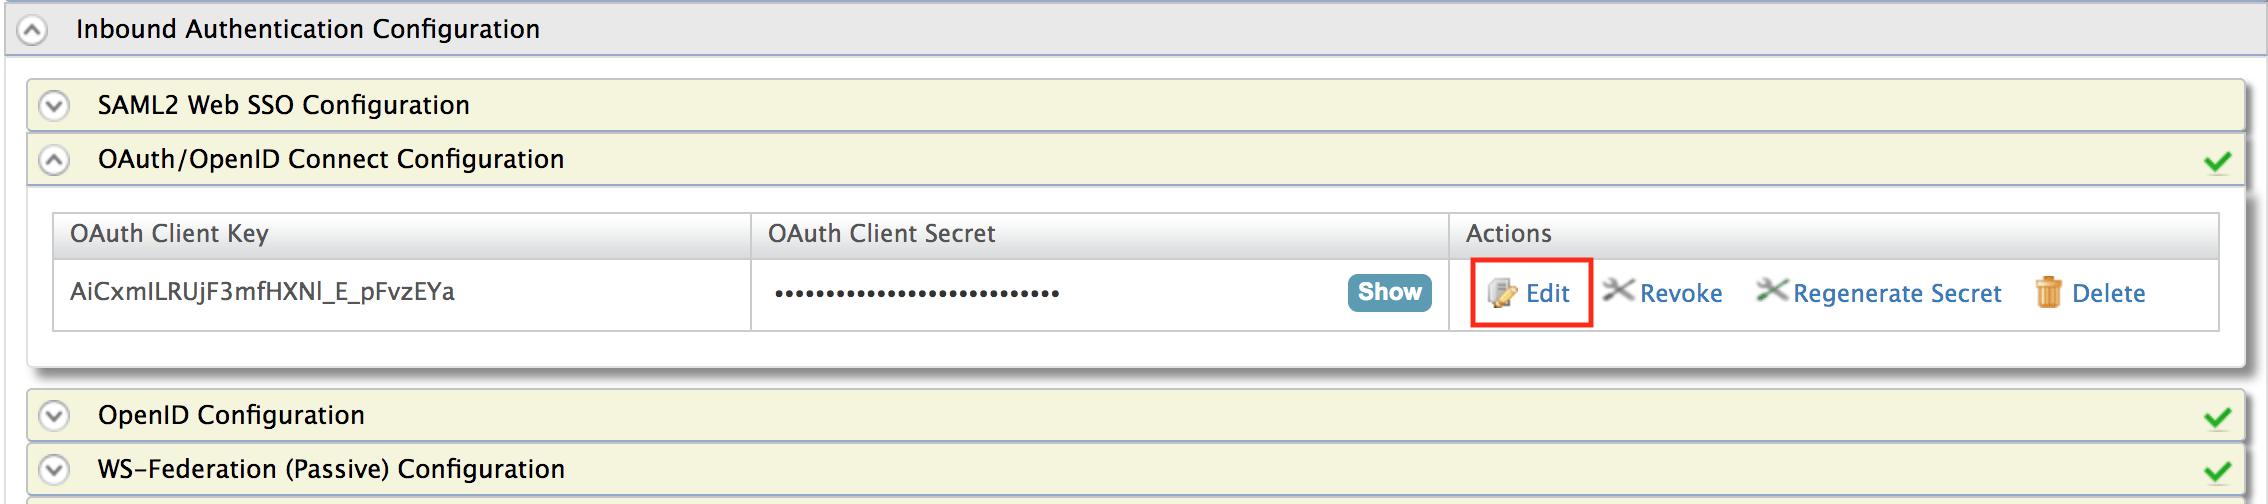 OAuth configuration